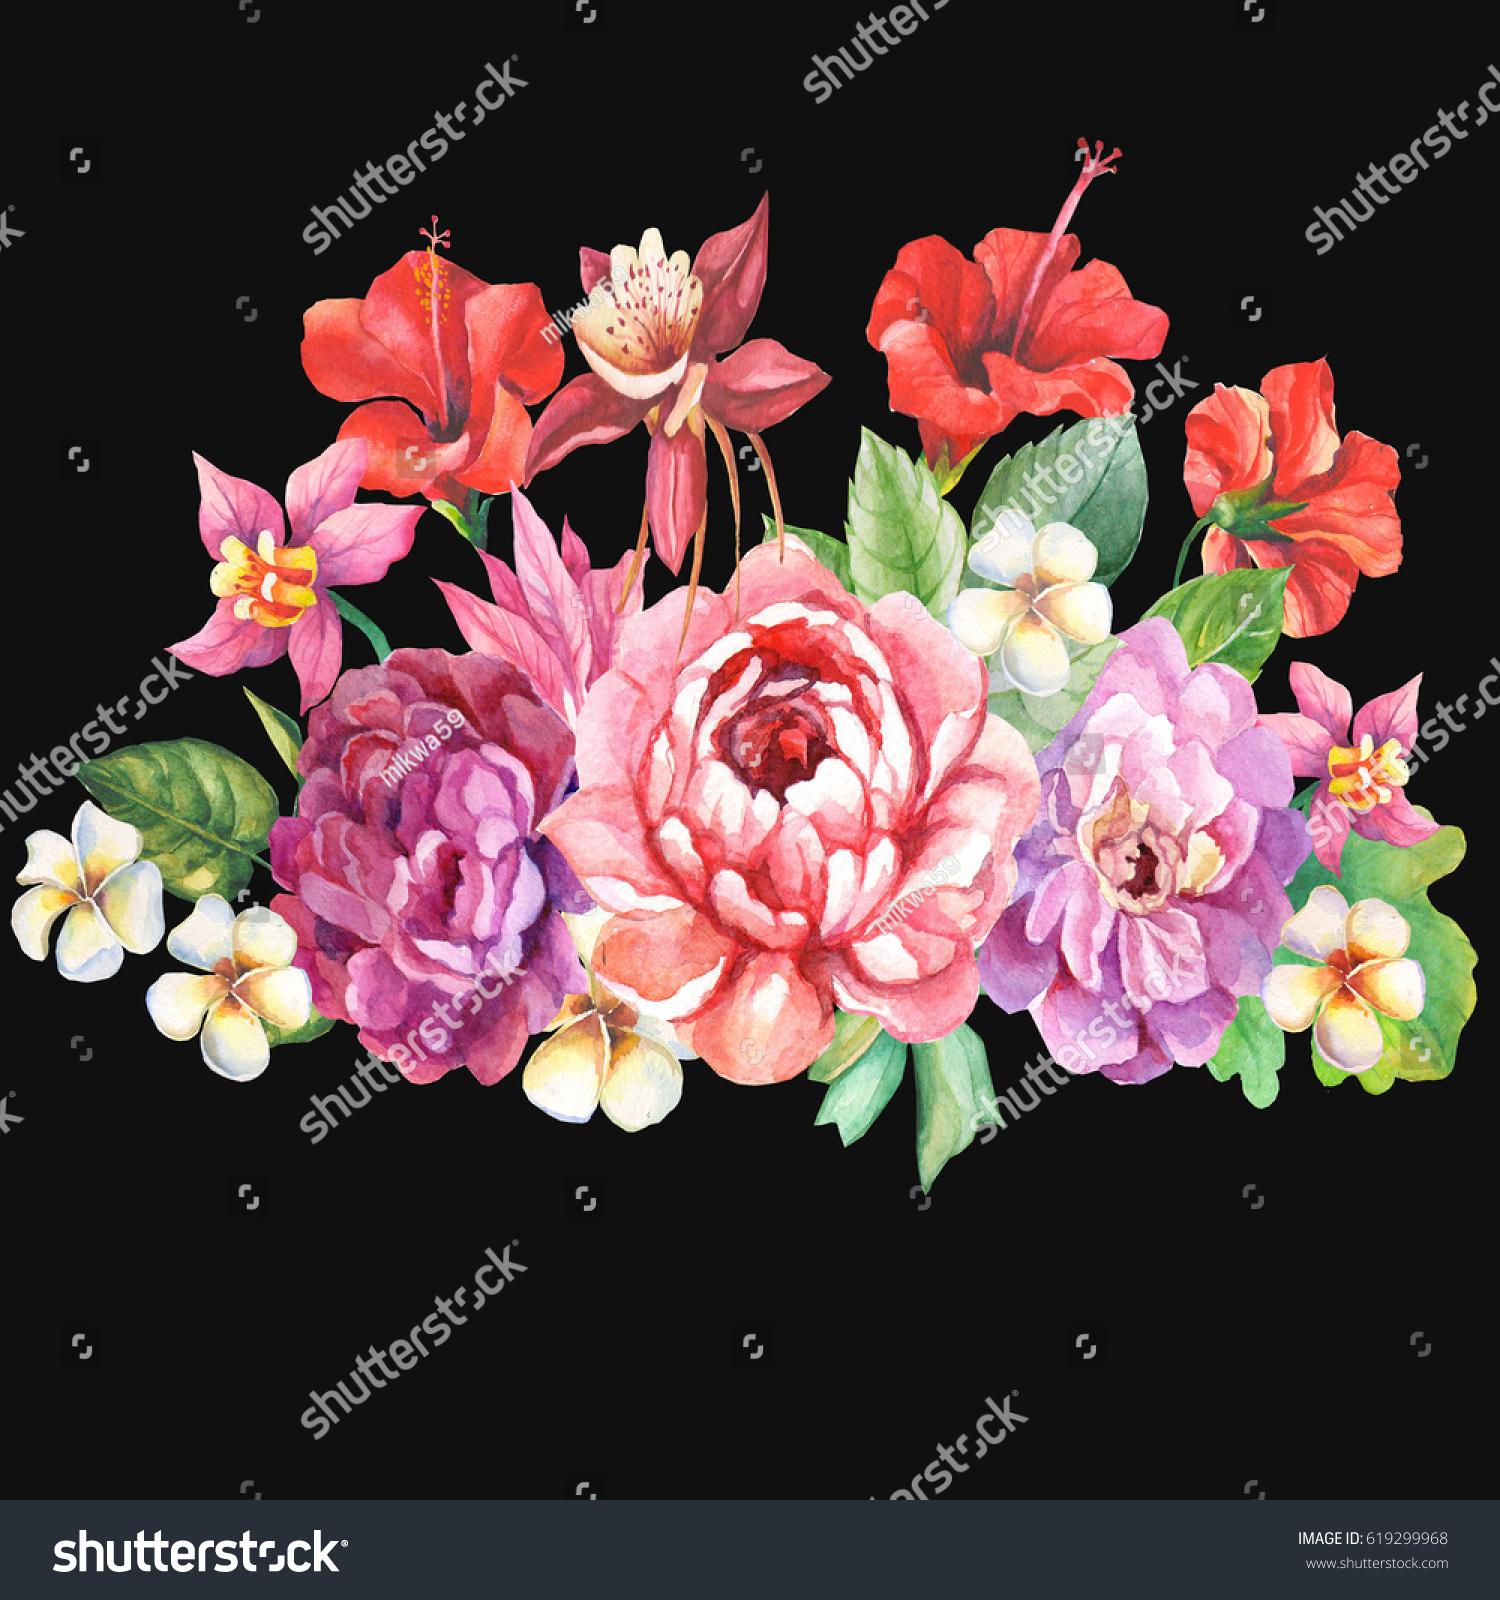 Beautiful tropical flowers on black background stock illustration beautiful tropical flowers on black background izmirmasajfo